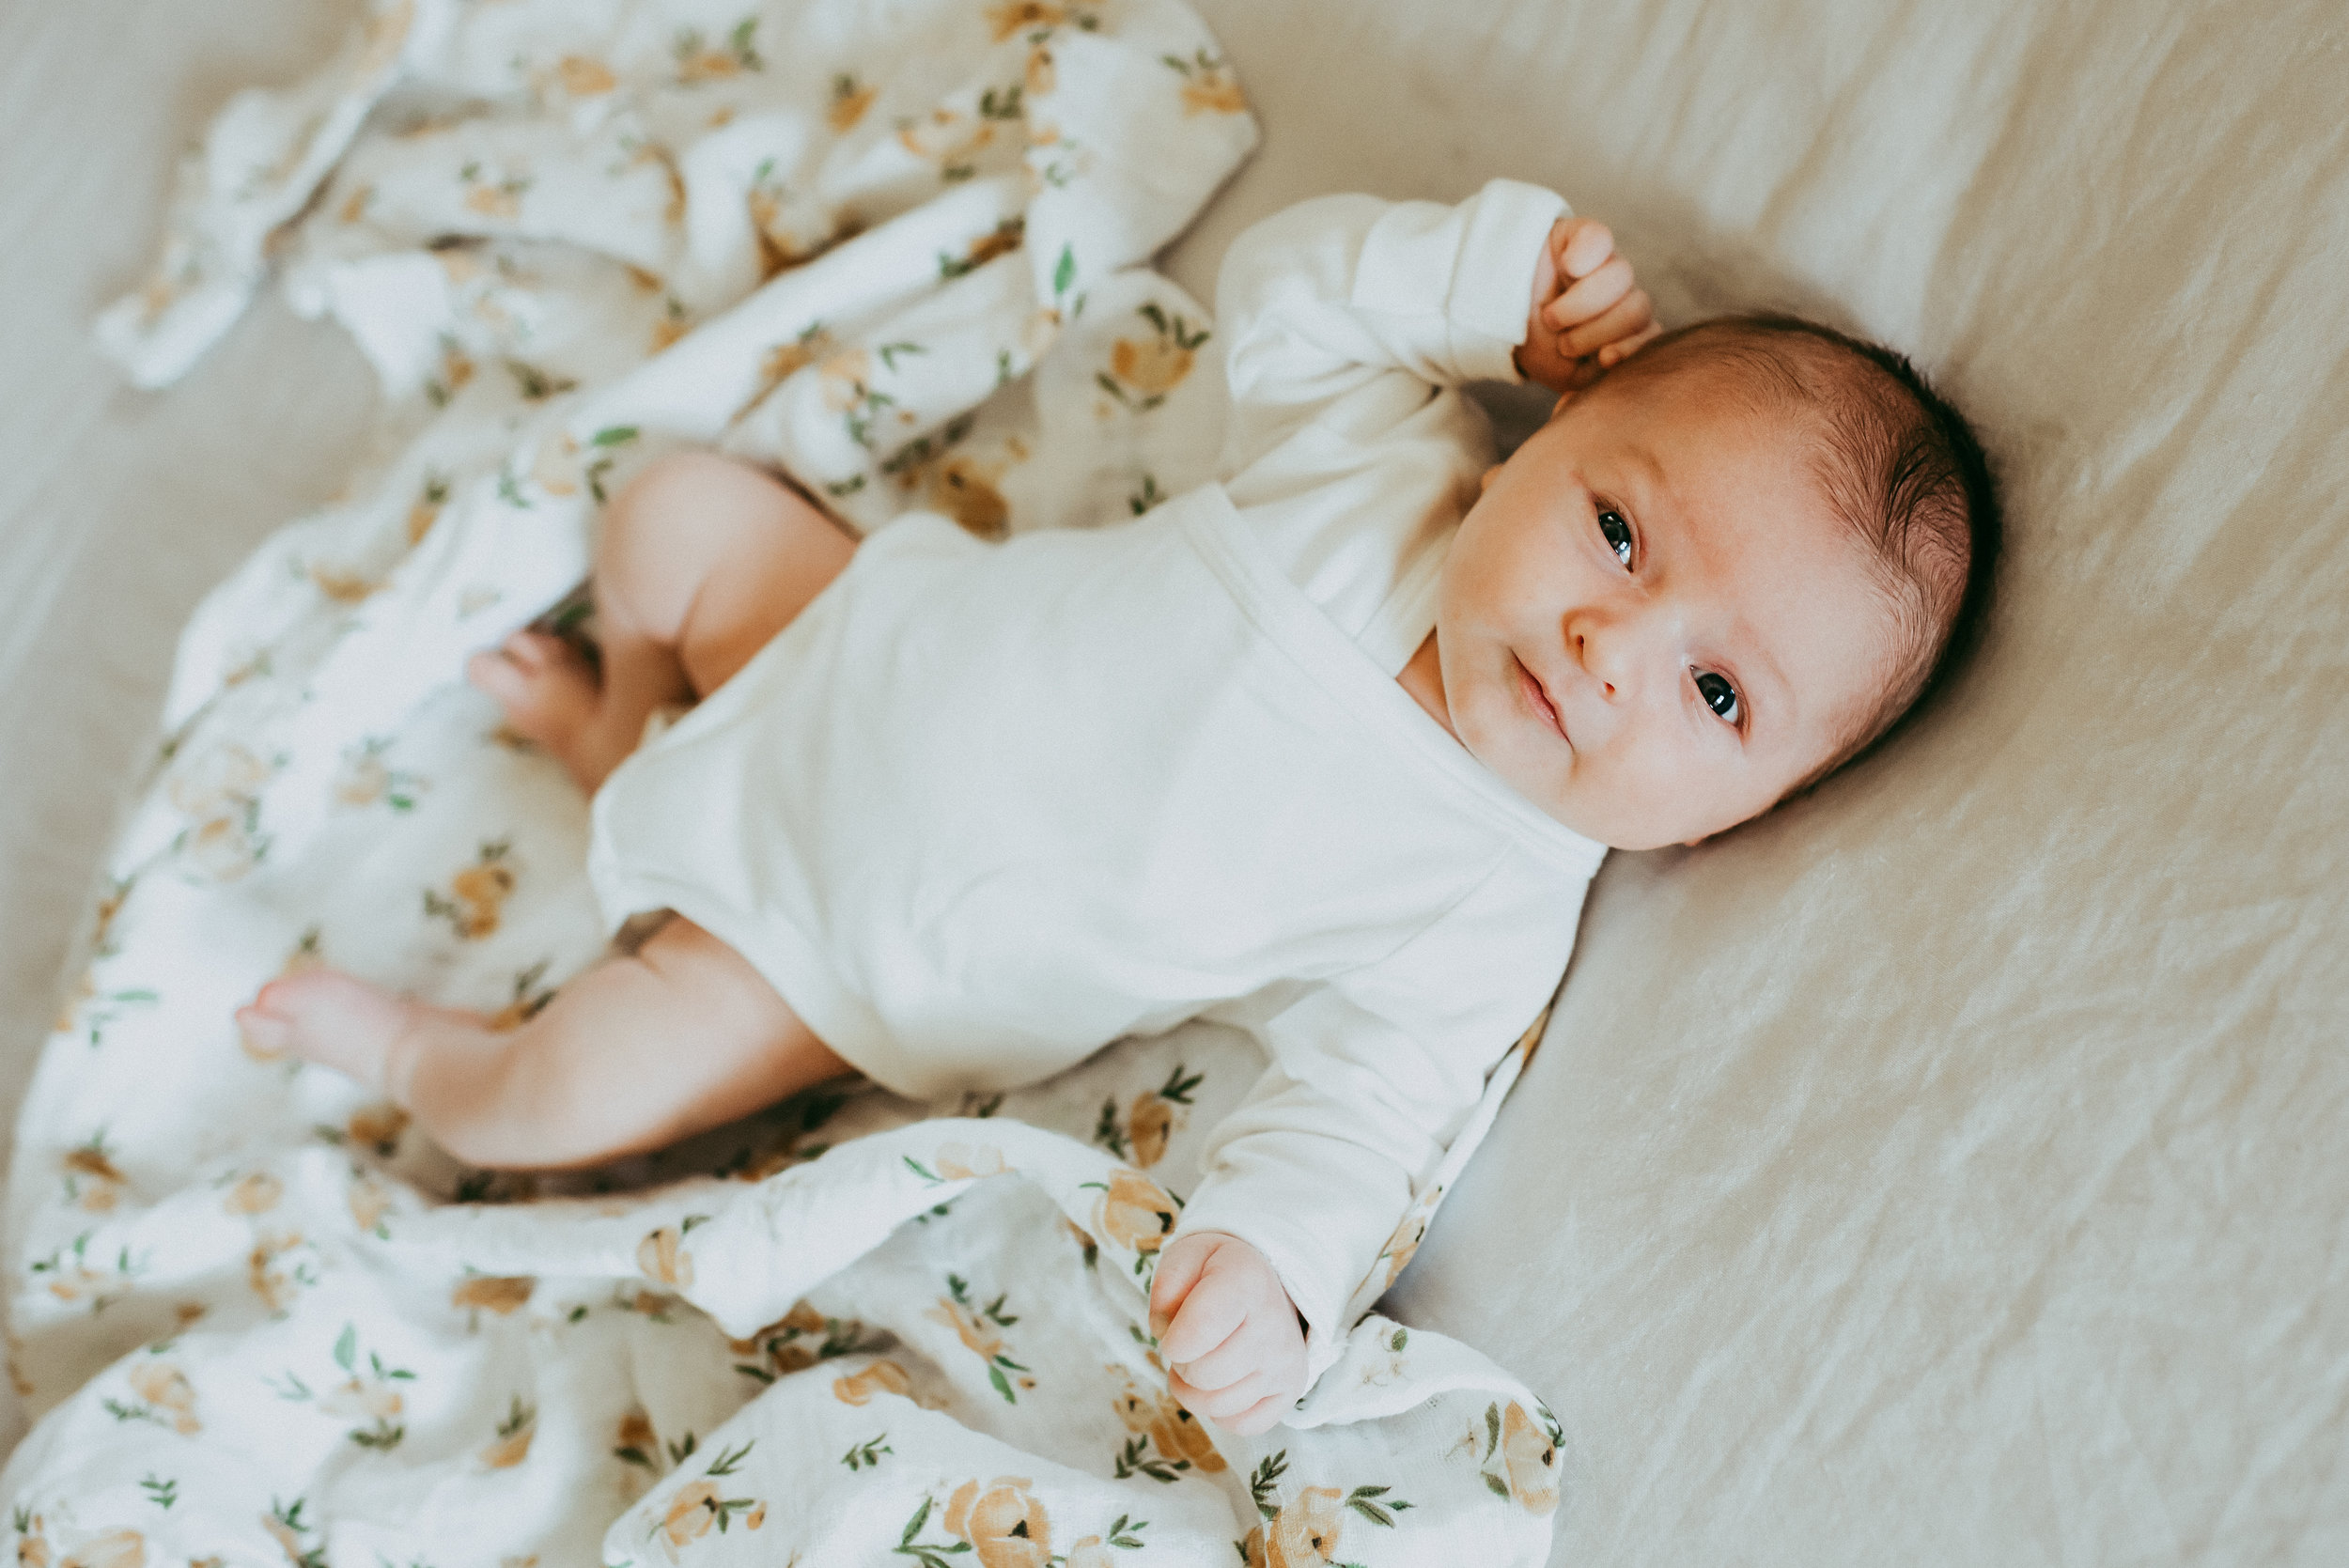 BabyKate_StoriedPhotography_2019-106.jpg